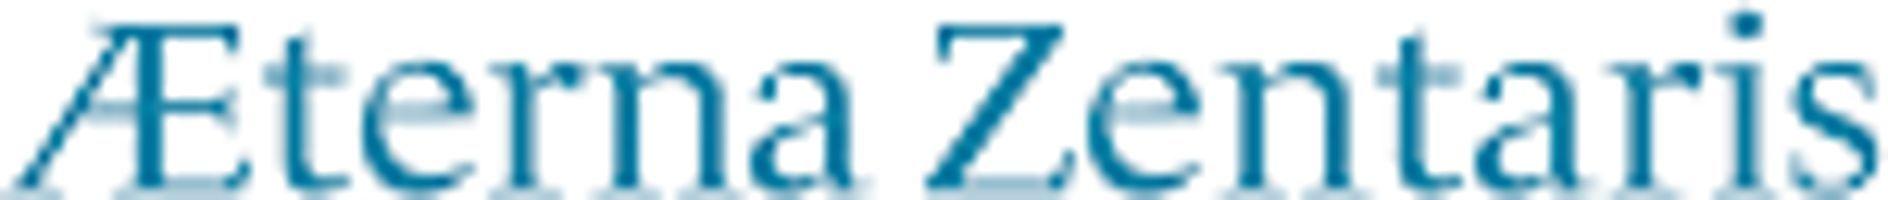 AEterna Zentaris Inc. (AEZS-T) — Stockchase